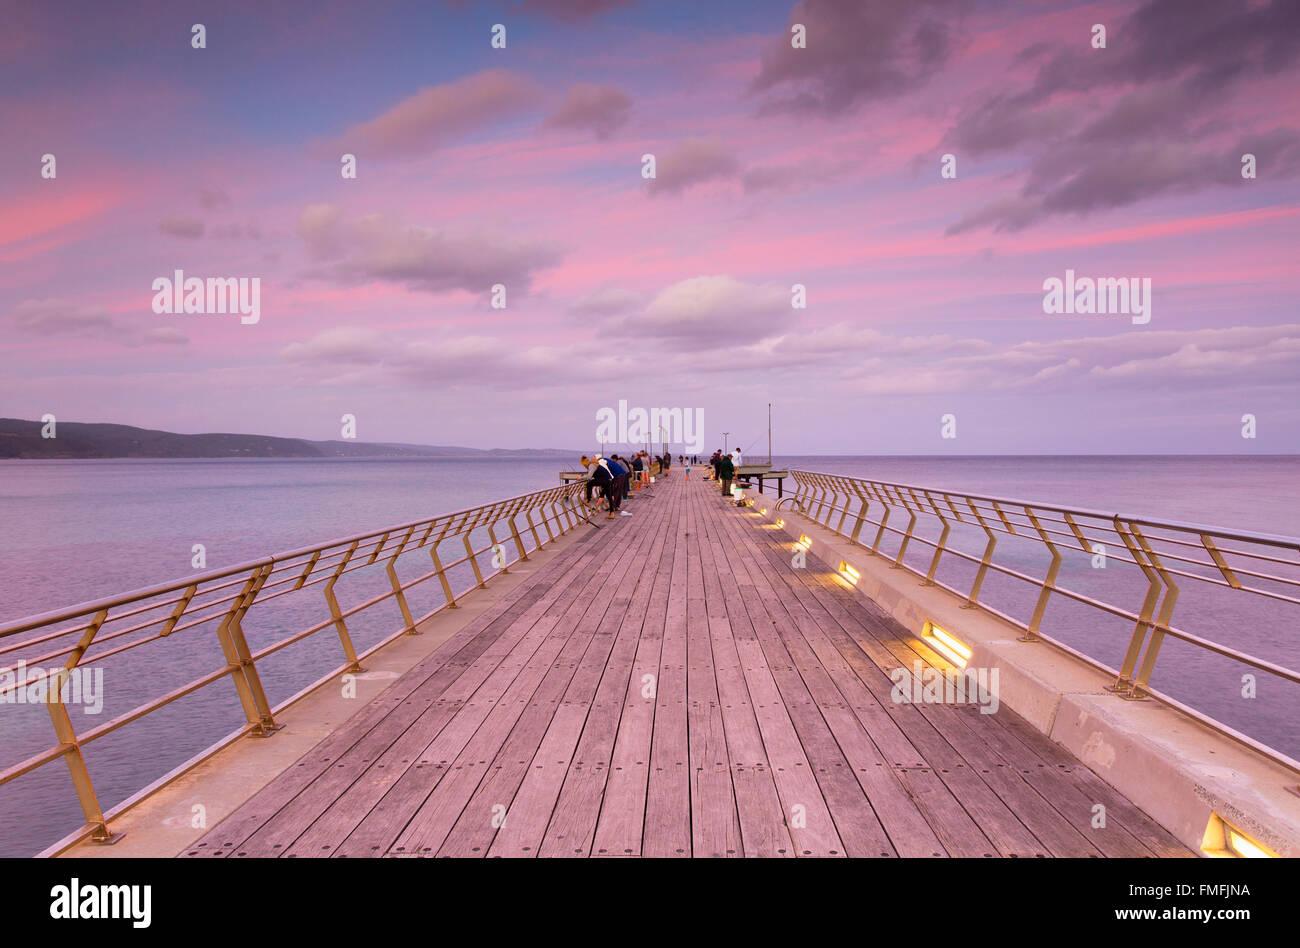 Muelle al atardecer, Lorne, Great Ocean Road, Victoria, Australia Imagen De Stock